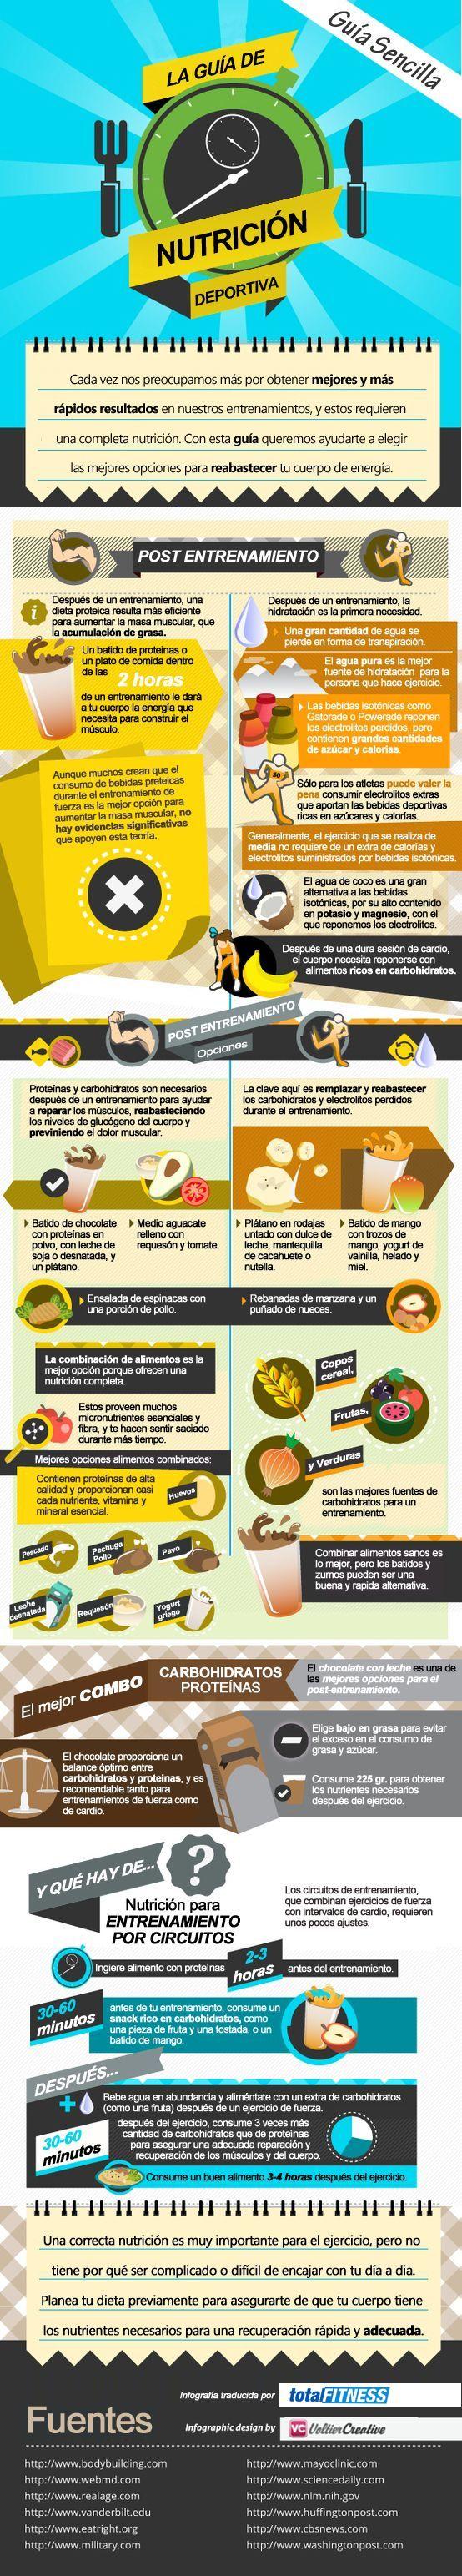 Gu�a r�pida de nutrici�n deportiva (Parte II)